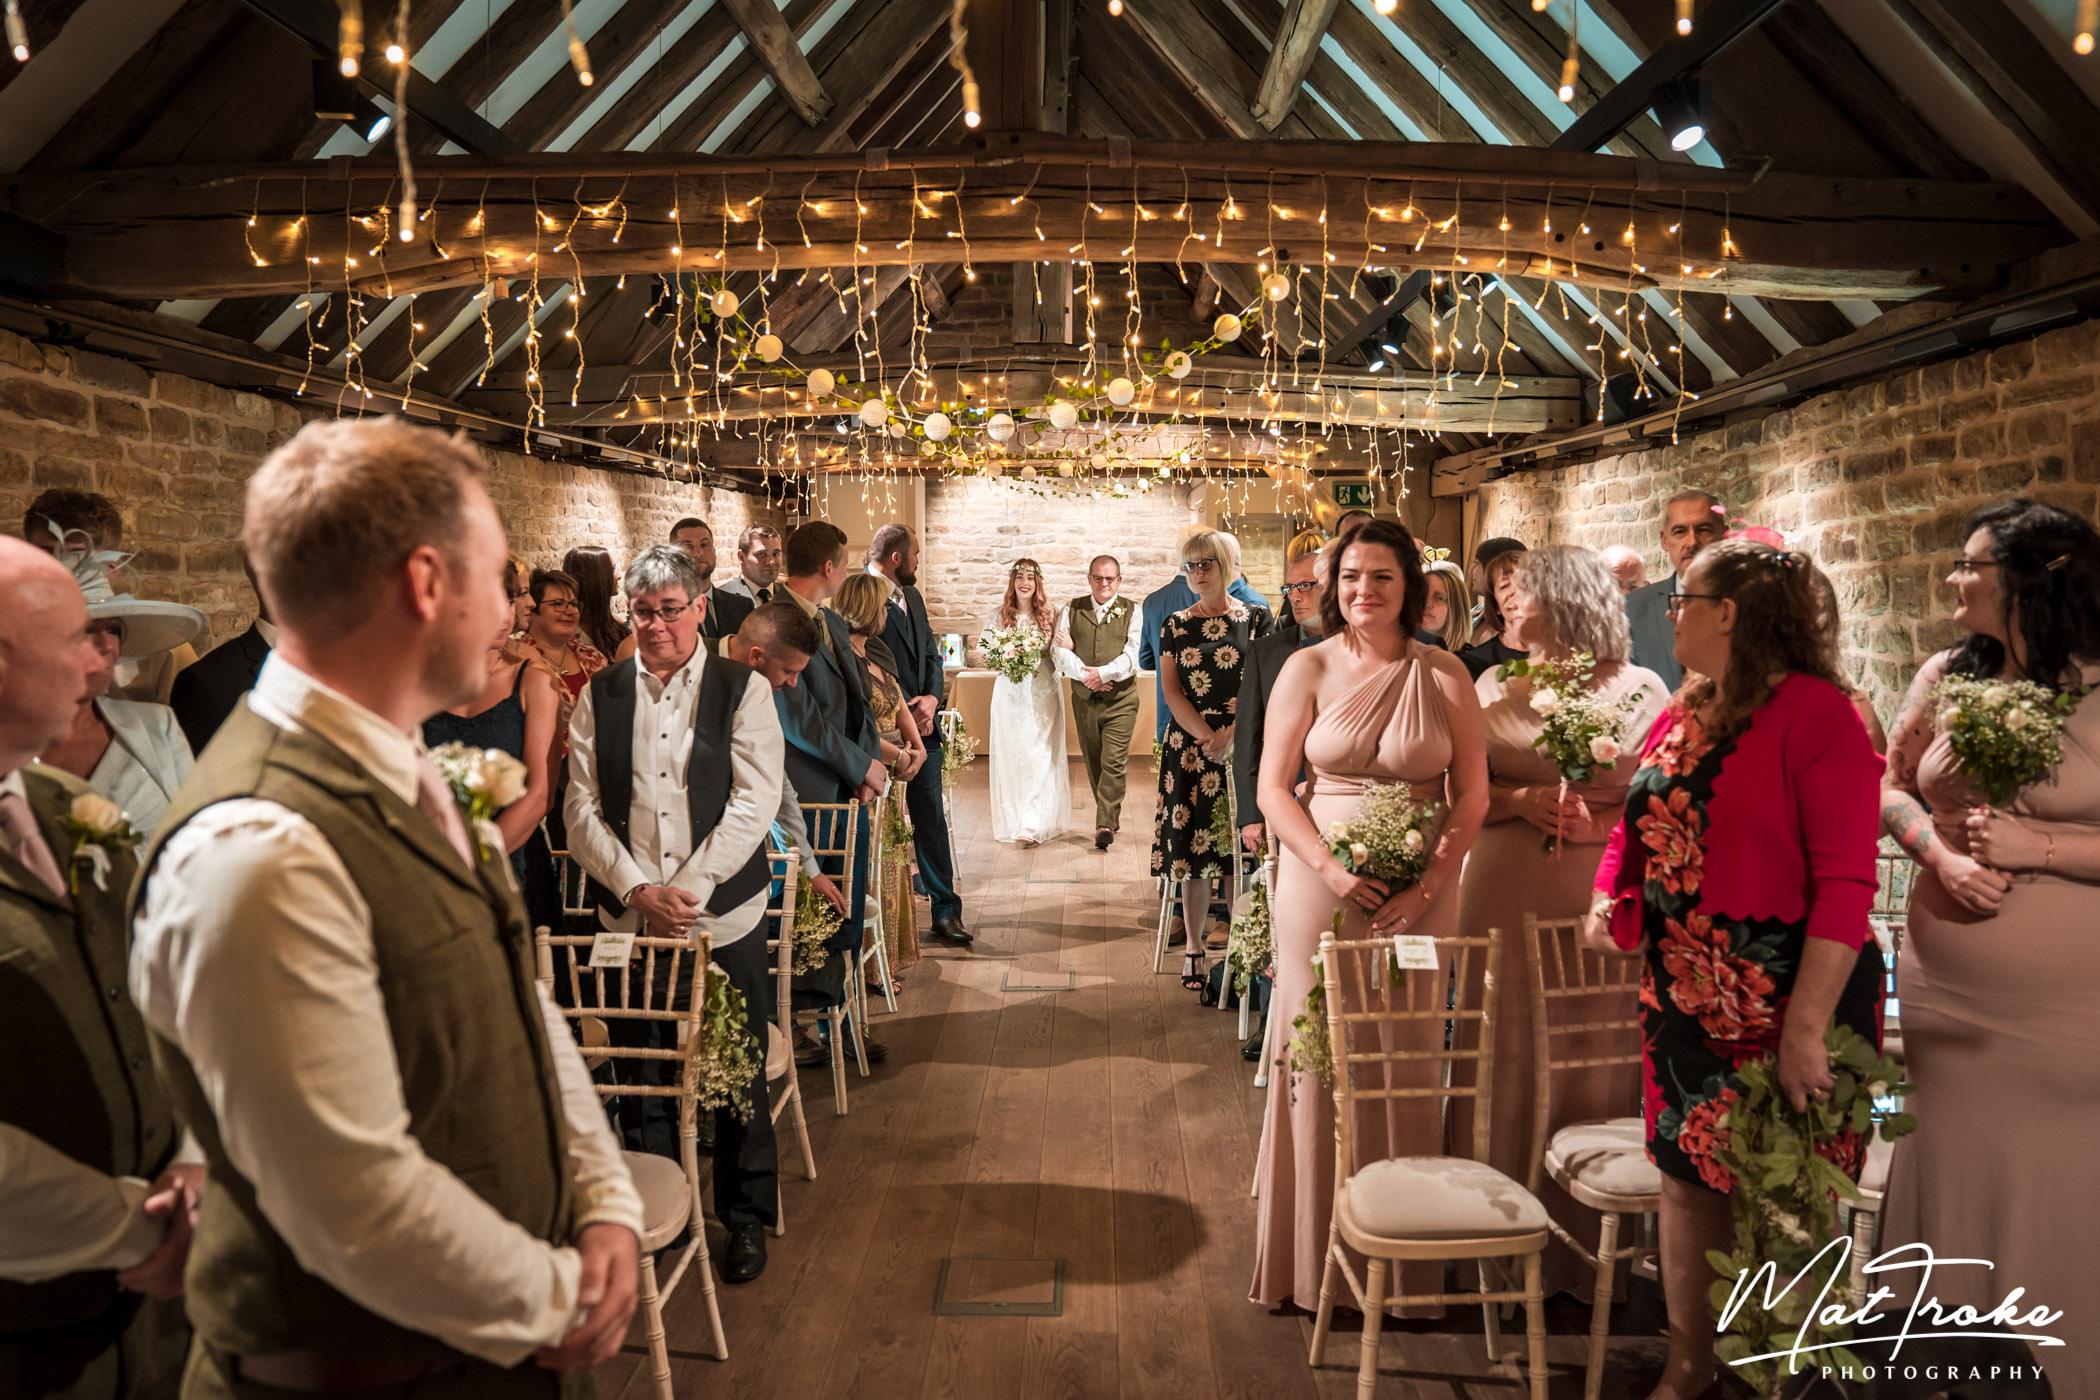 Dronfield Hall Barn Chesterfield Wedding Photographer - Mat Troke Photography